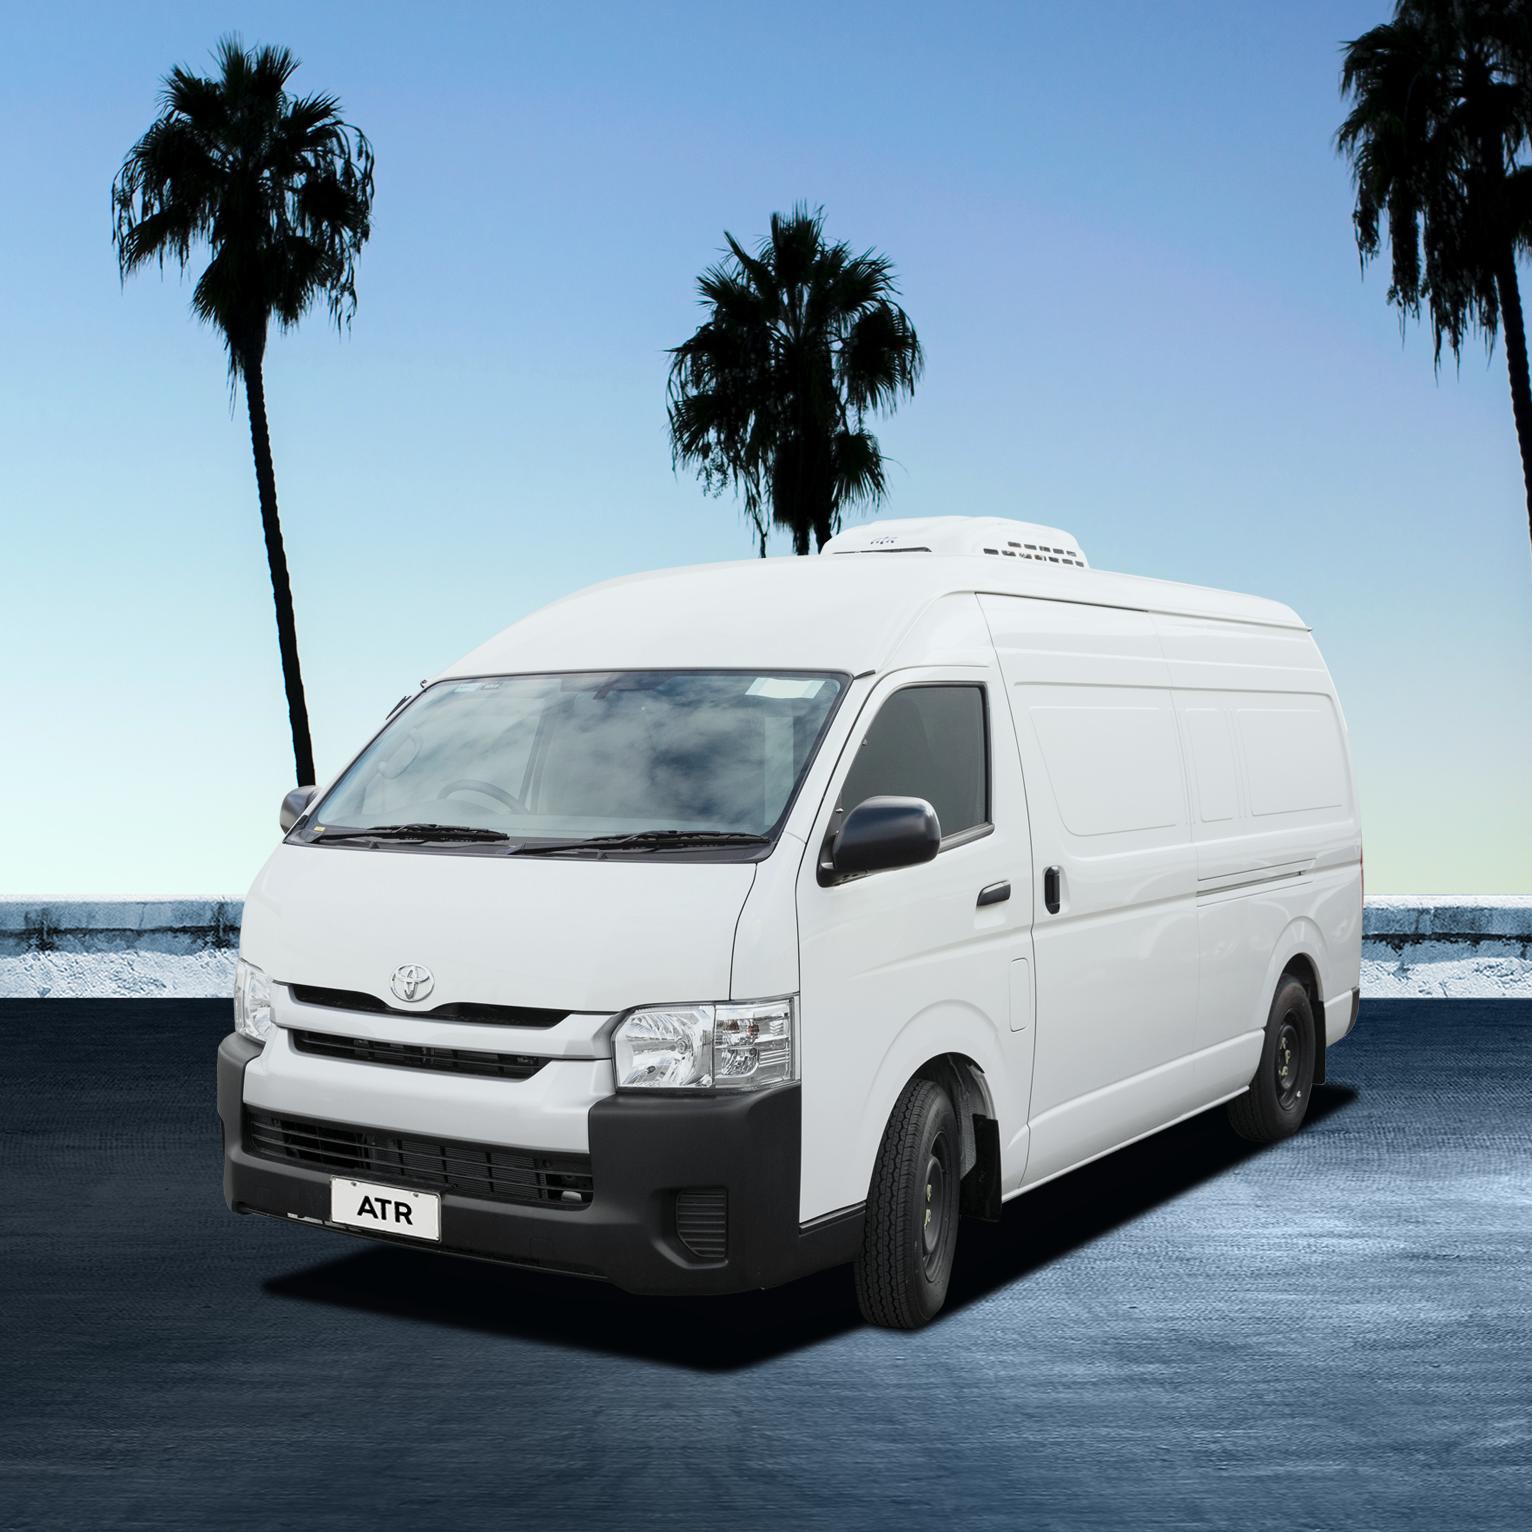 ATR-van-refrigeration-unit-repairs.png